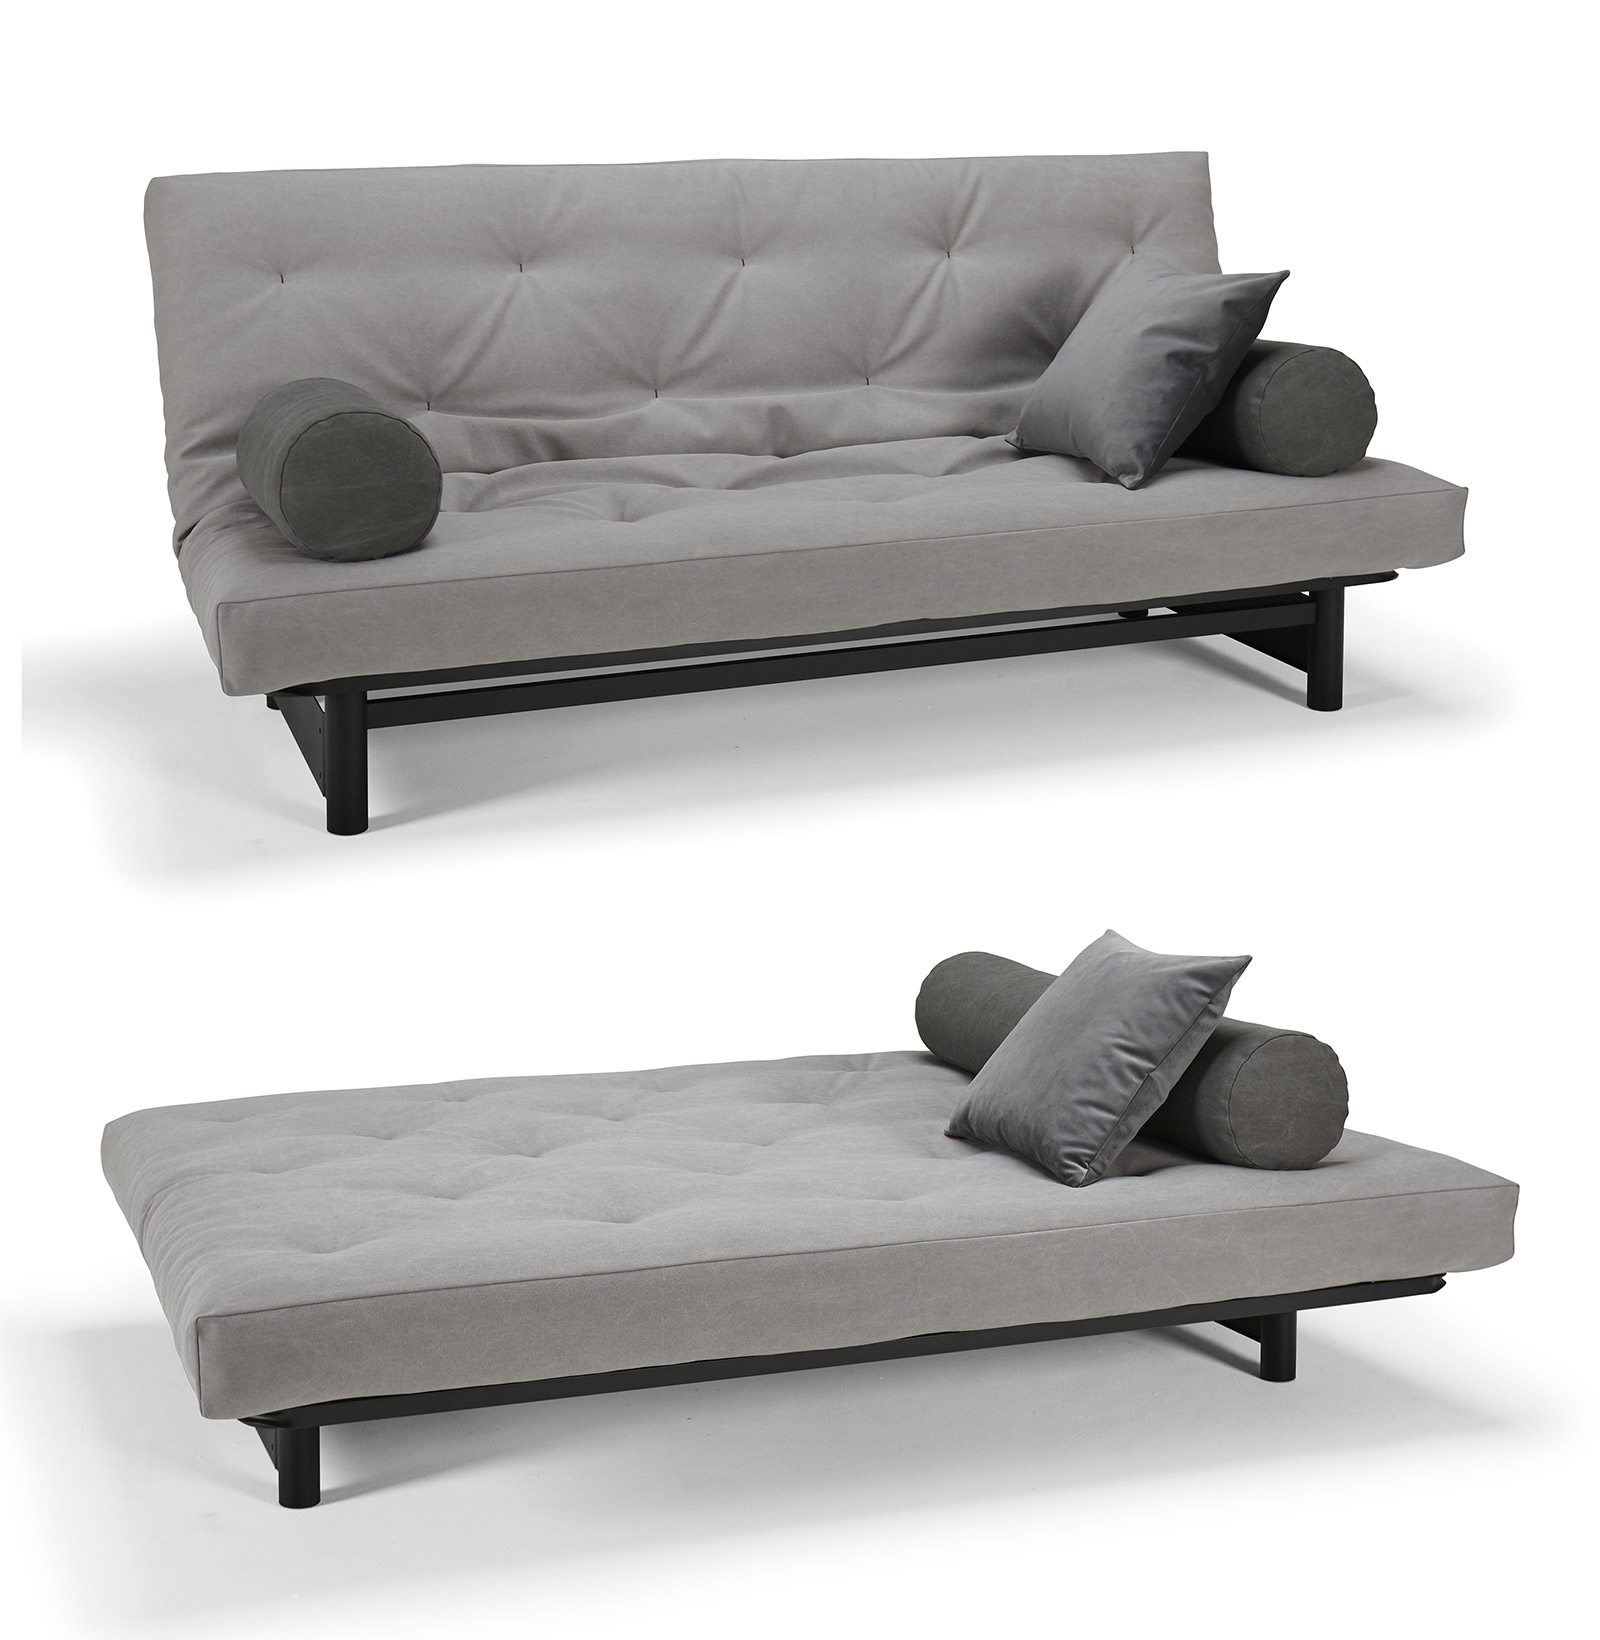 Futon design canap s lits facile fuji canap lit for Canape lit facile a ouvrir